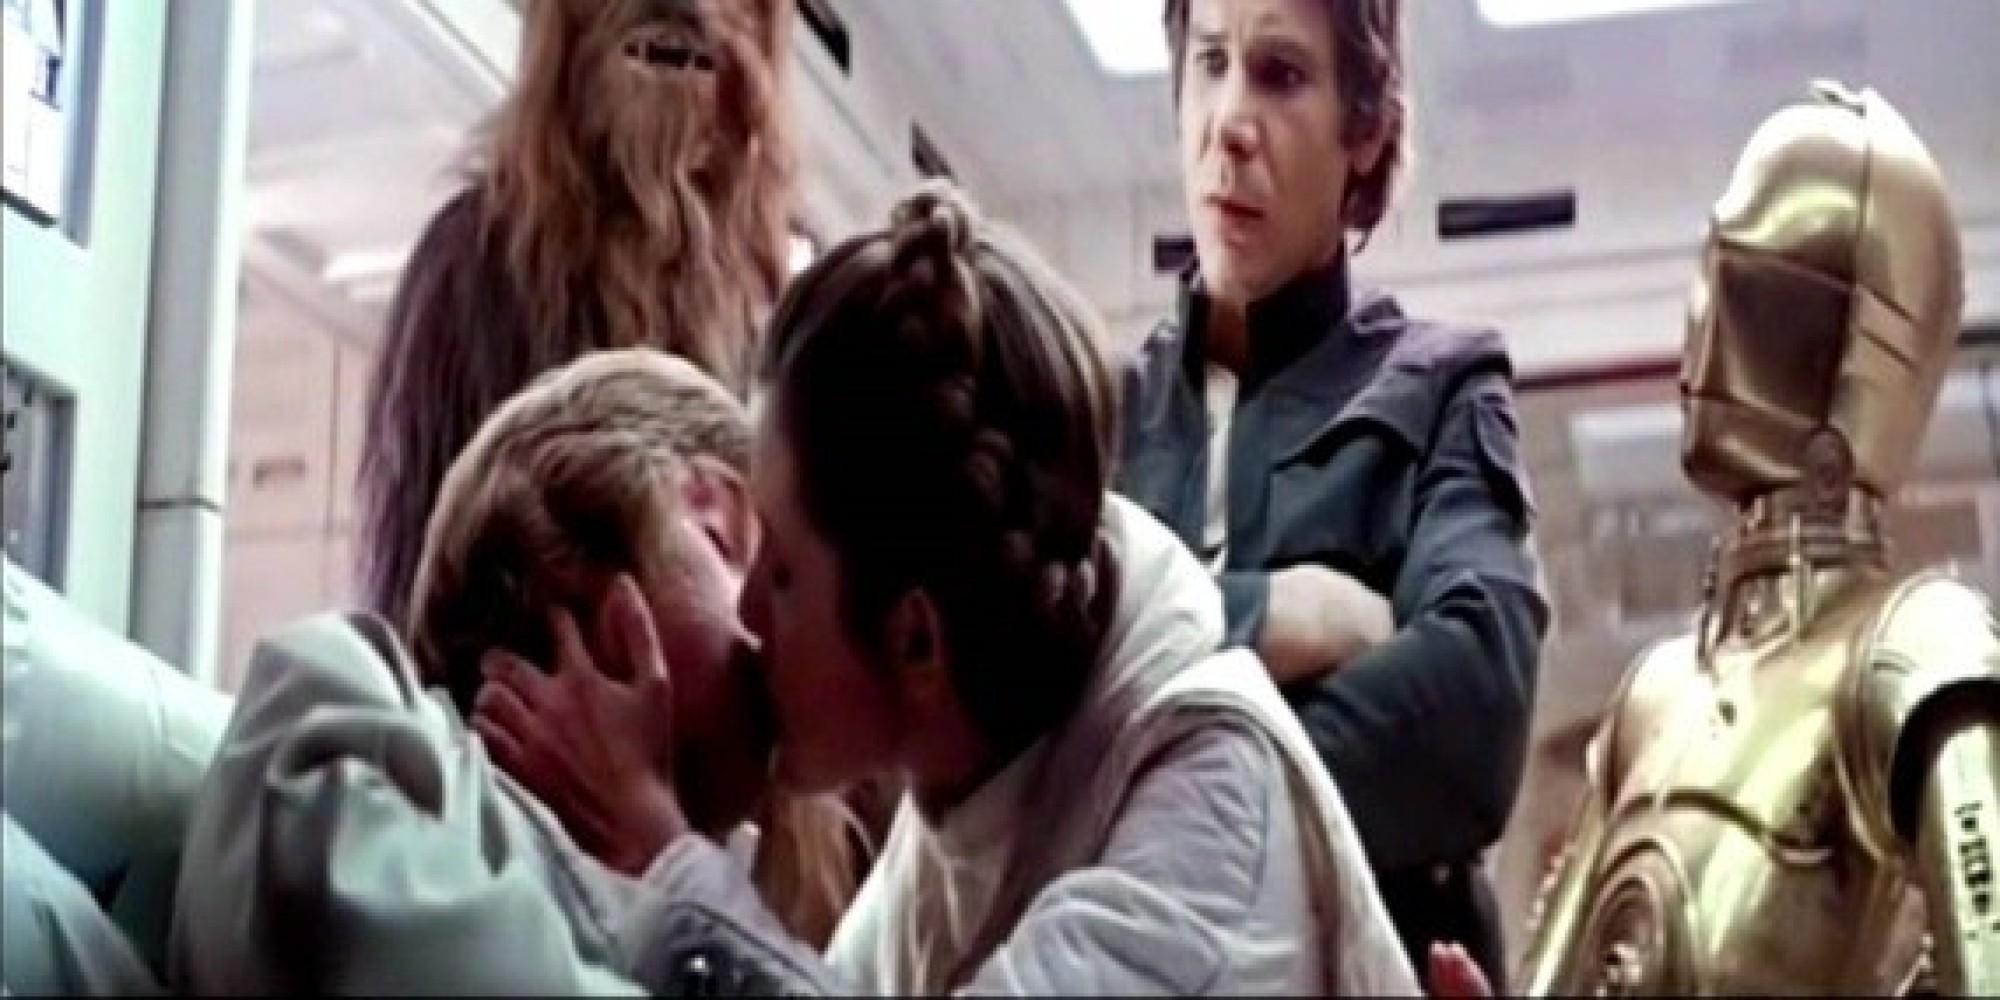 Luke and princess leia kiss